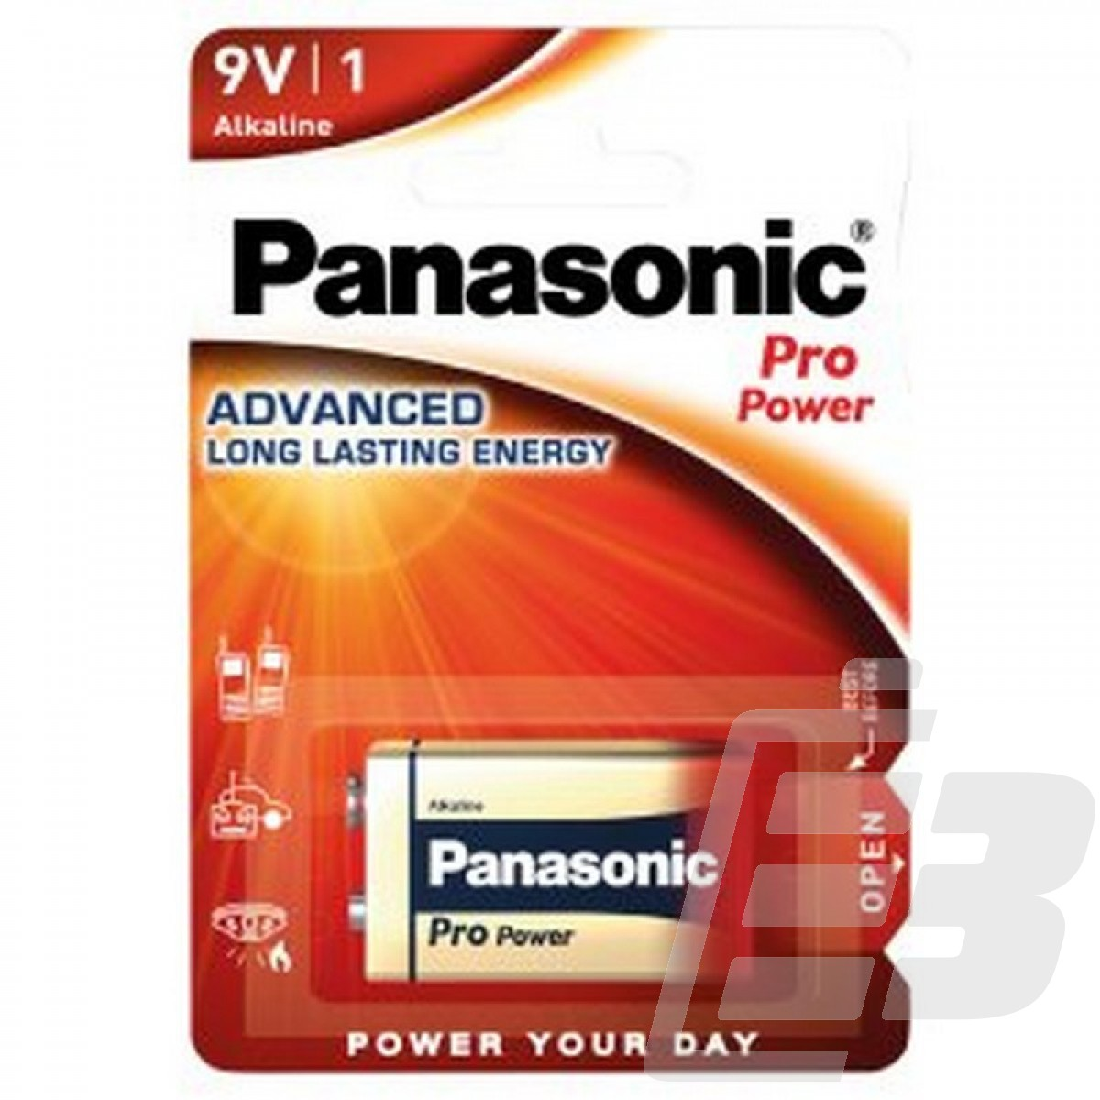 Panasonic PRO 9V